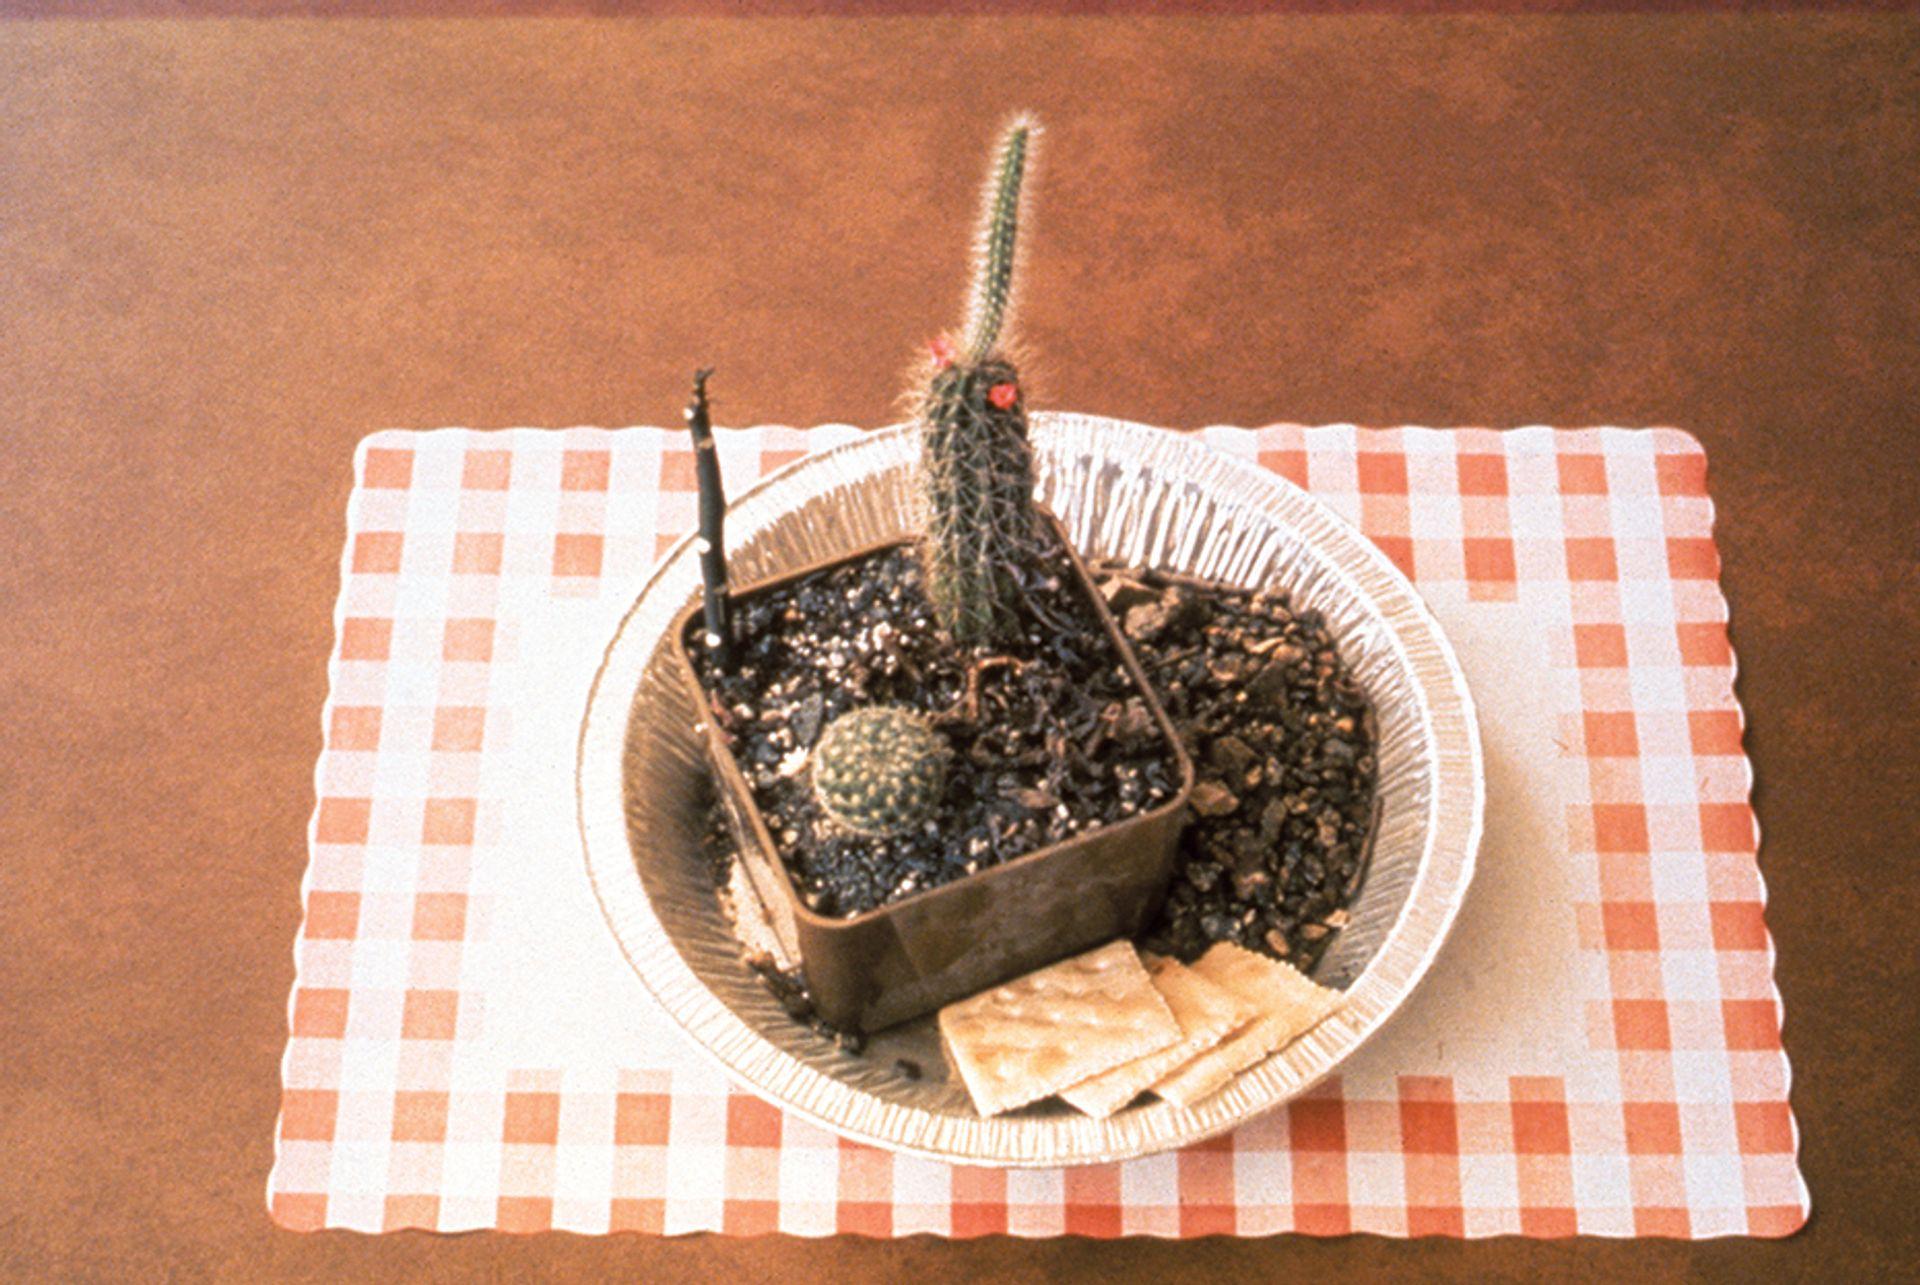 Allen Ruppersberg's Meals from Al's Cafe (1969) Courtesy of the artist, Greene Naftali, New York and Marc Selwyn Fine Art, Los Angeles; Photo: Gary Krueger, scan: Augusta Wood